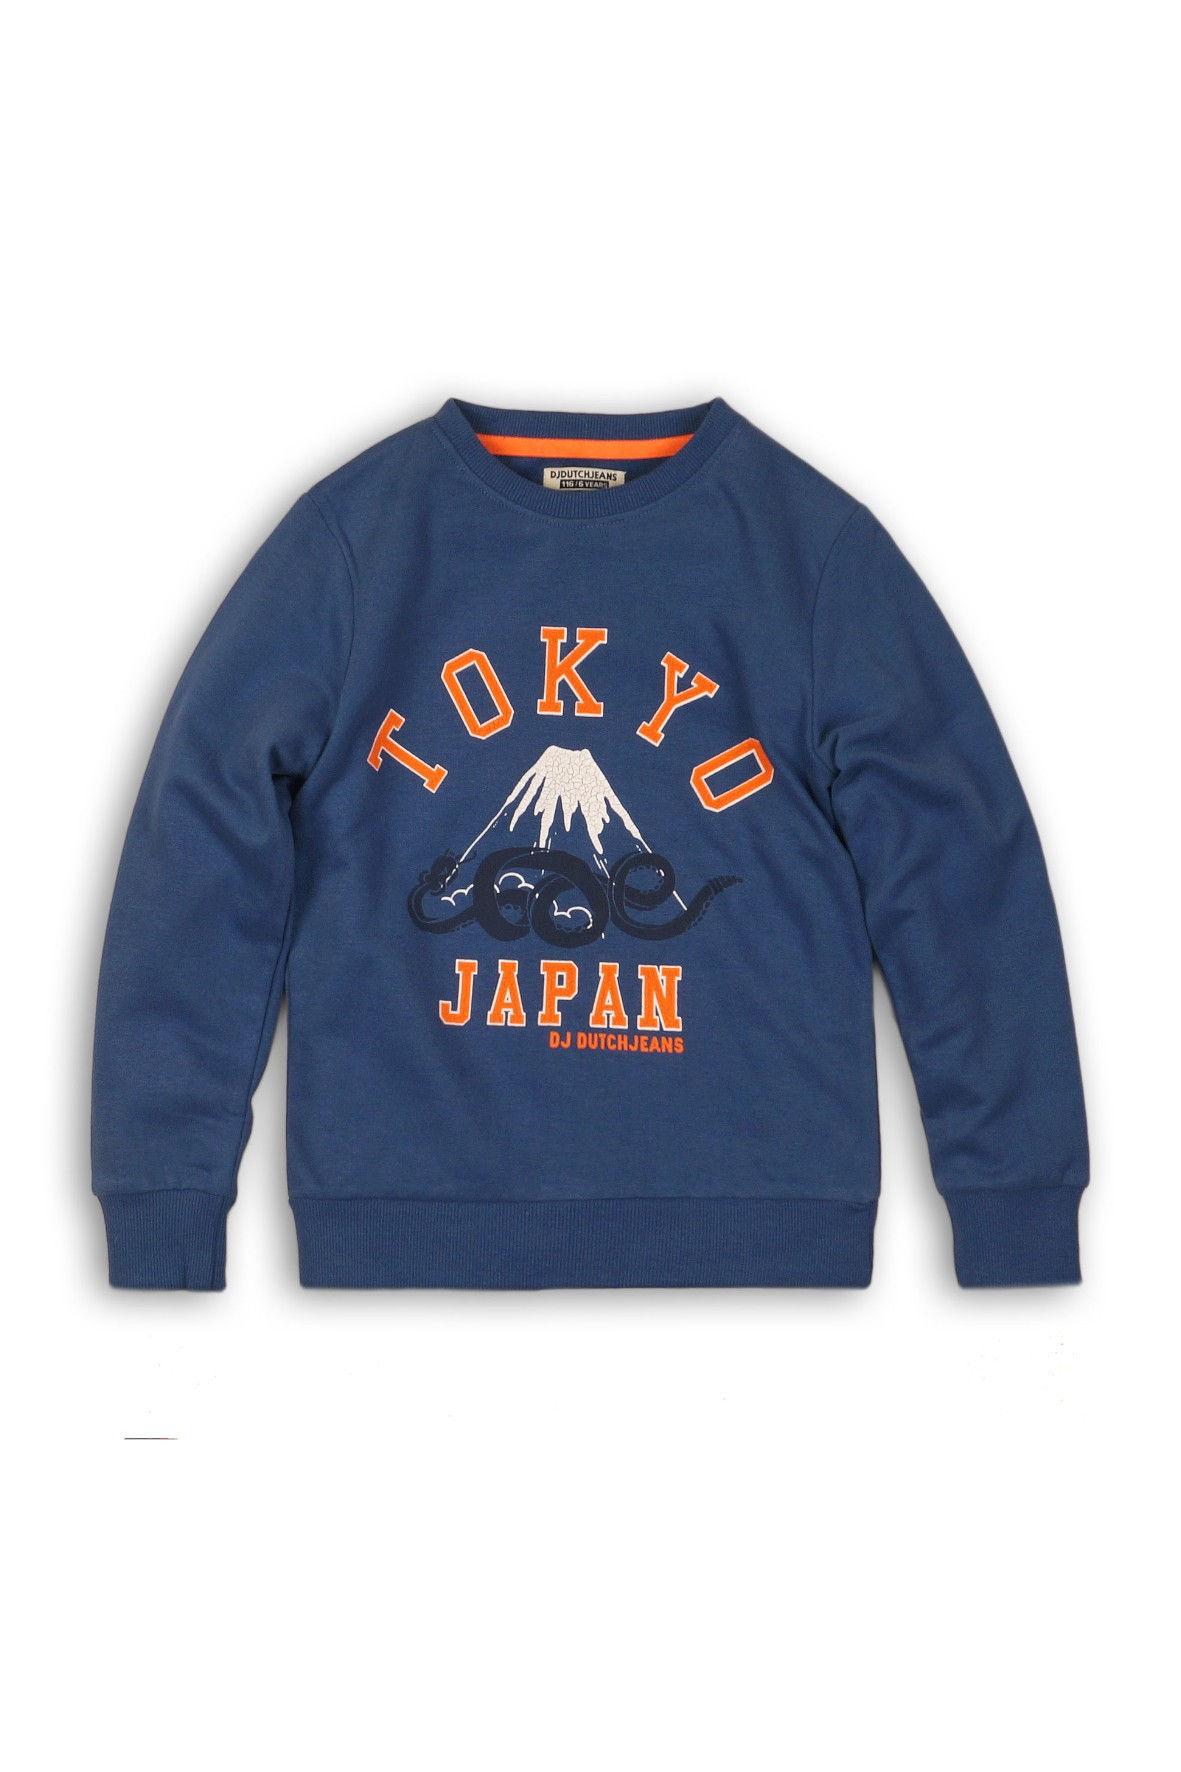 Bluza chłopięca nierozpinana- niebieska Tokyo